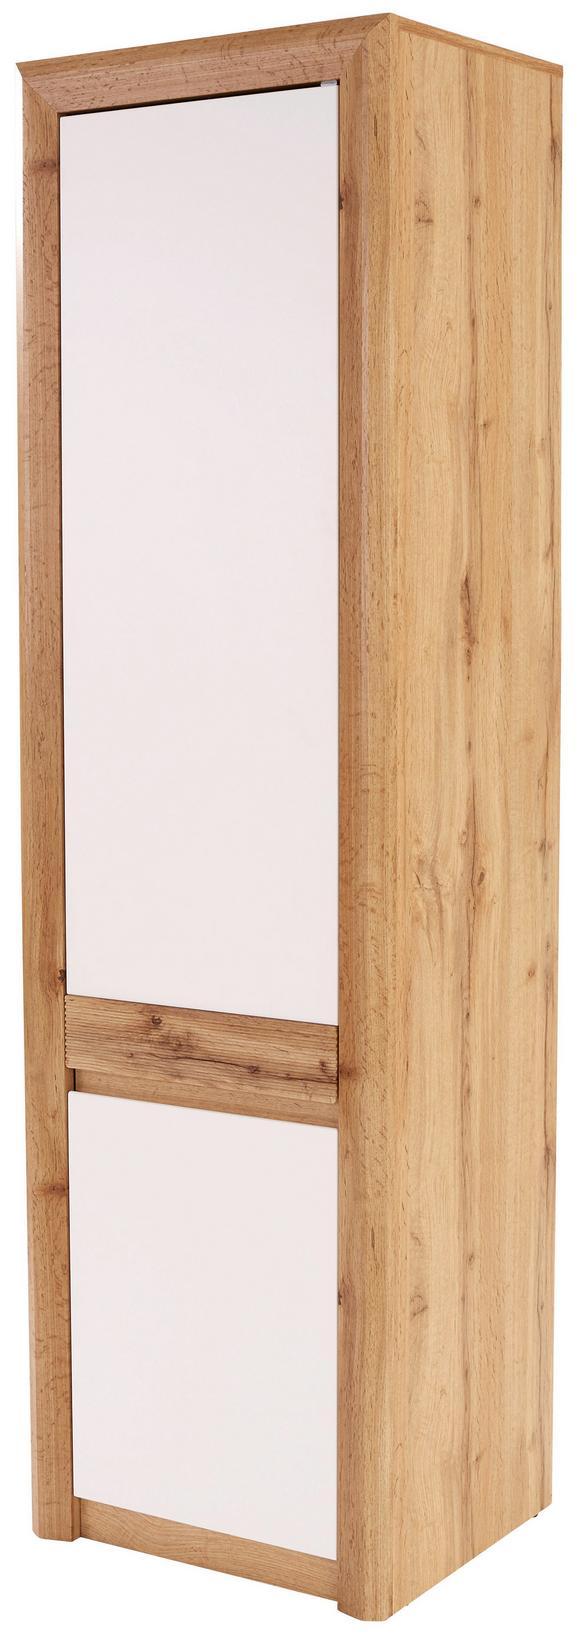 Omara Kashmir New - bela/hrast, Moderno, leseni material (57/192/41cm) - Zandiara